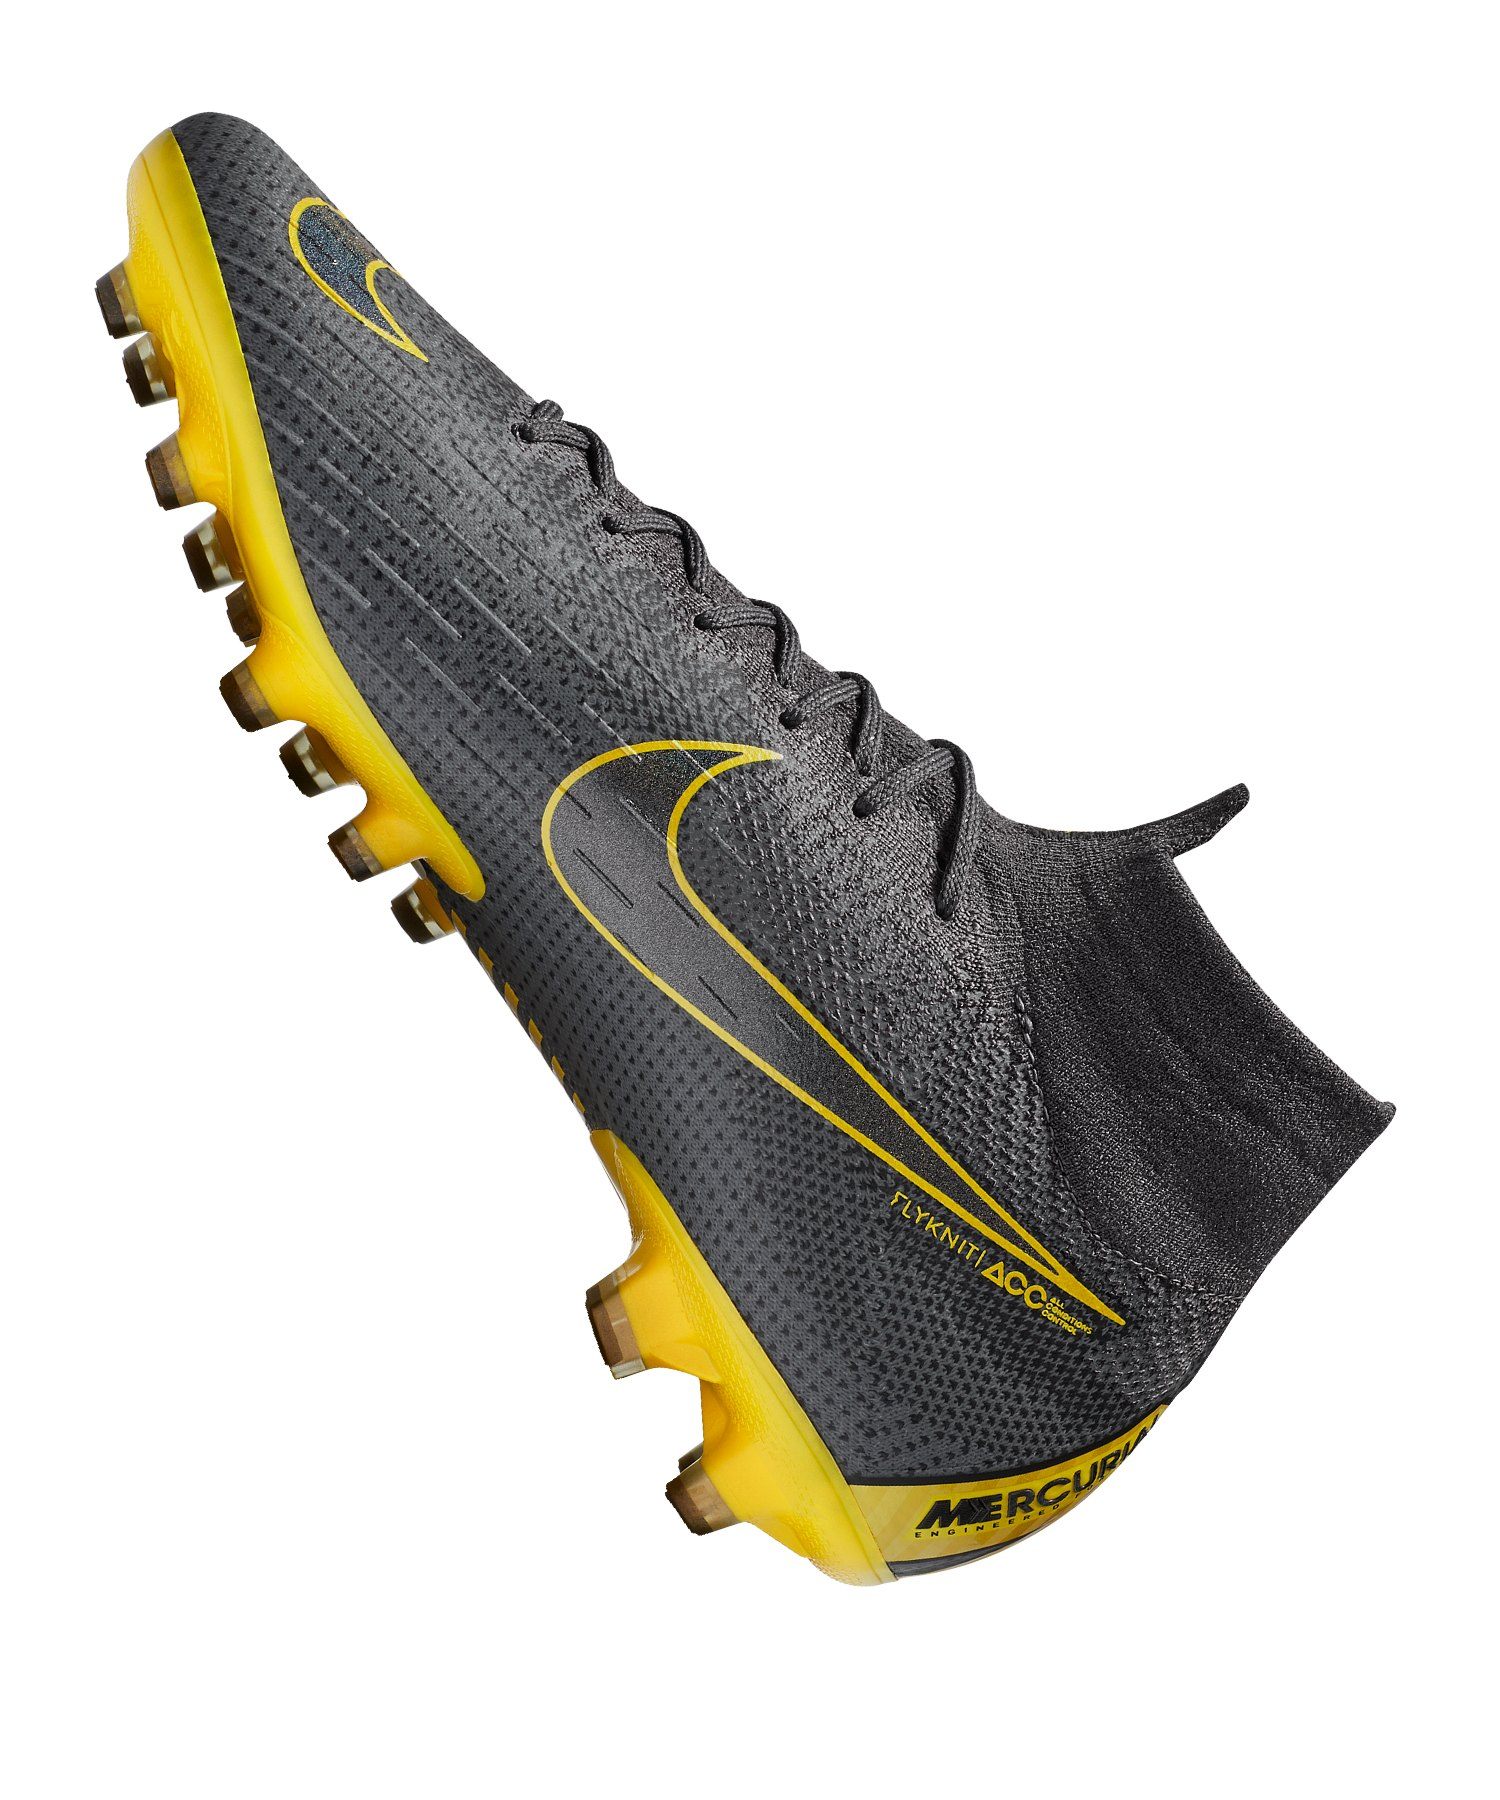 Ag Pro F070 Nike Elite Superfly Mercurial Vi 8wOPk0Xn